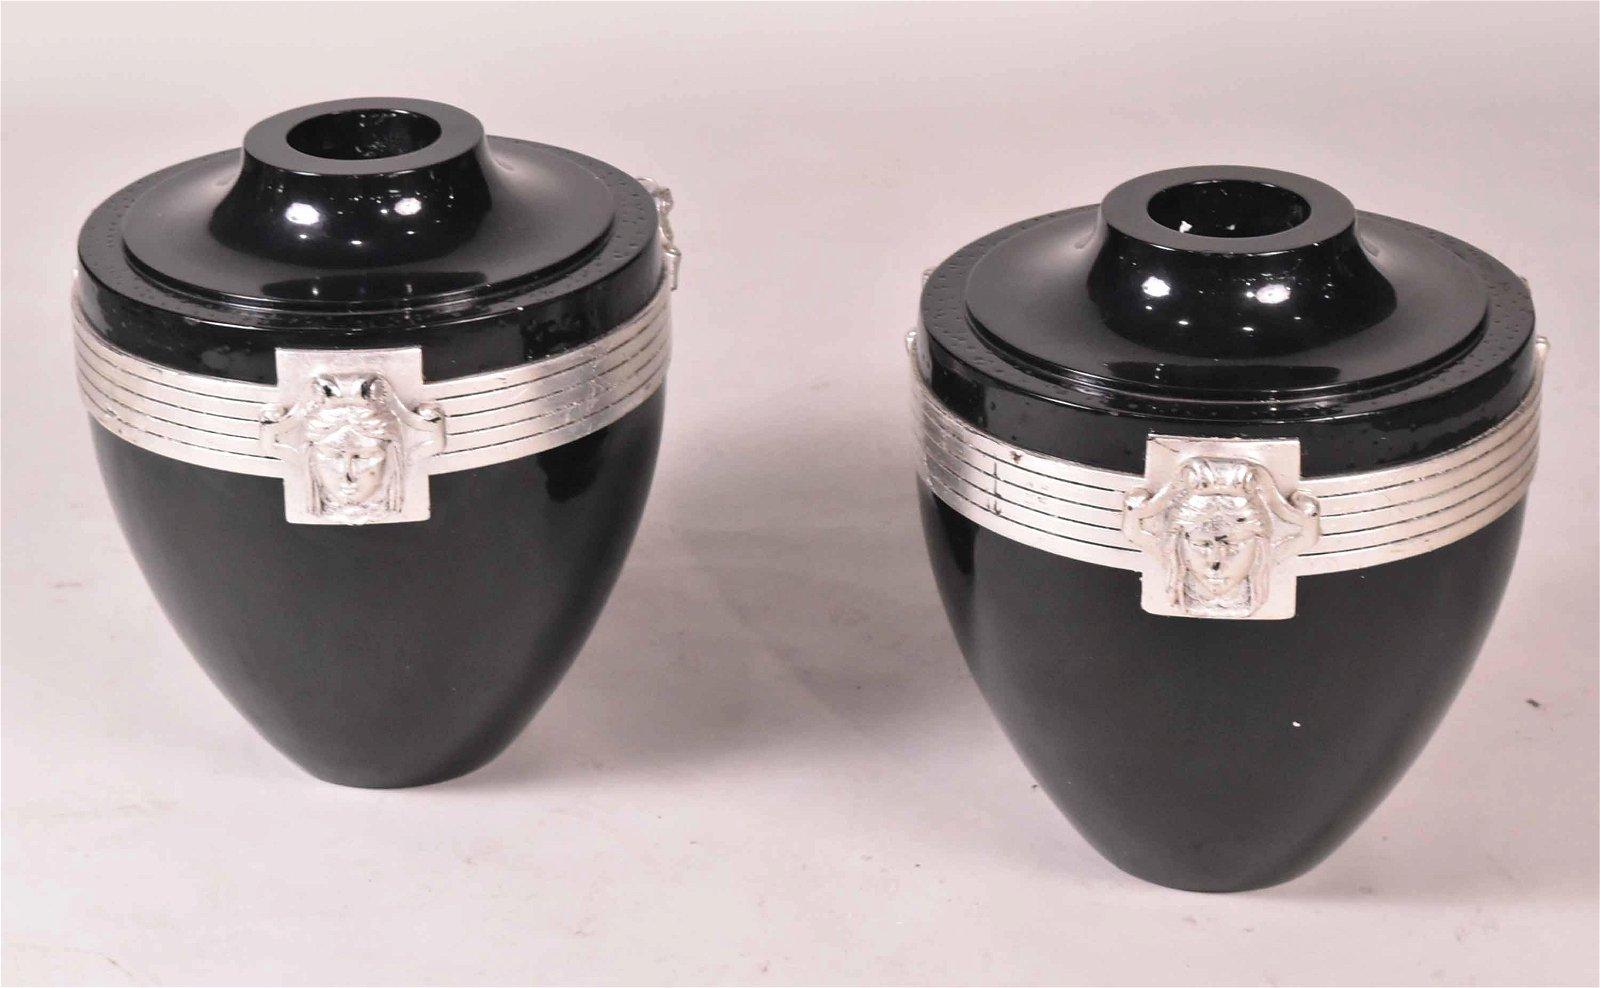 Pair of Ebonized & Silvered Metal Art Deco Vases